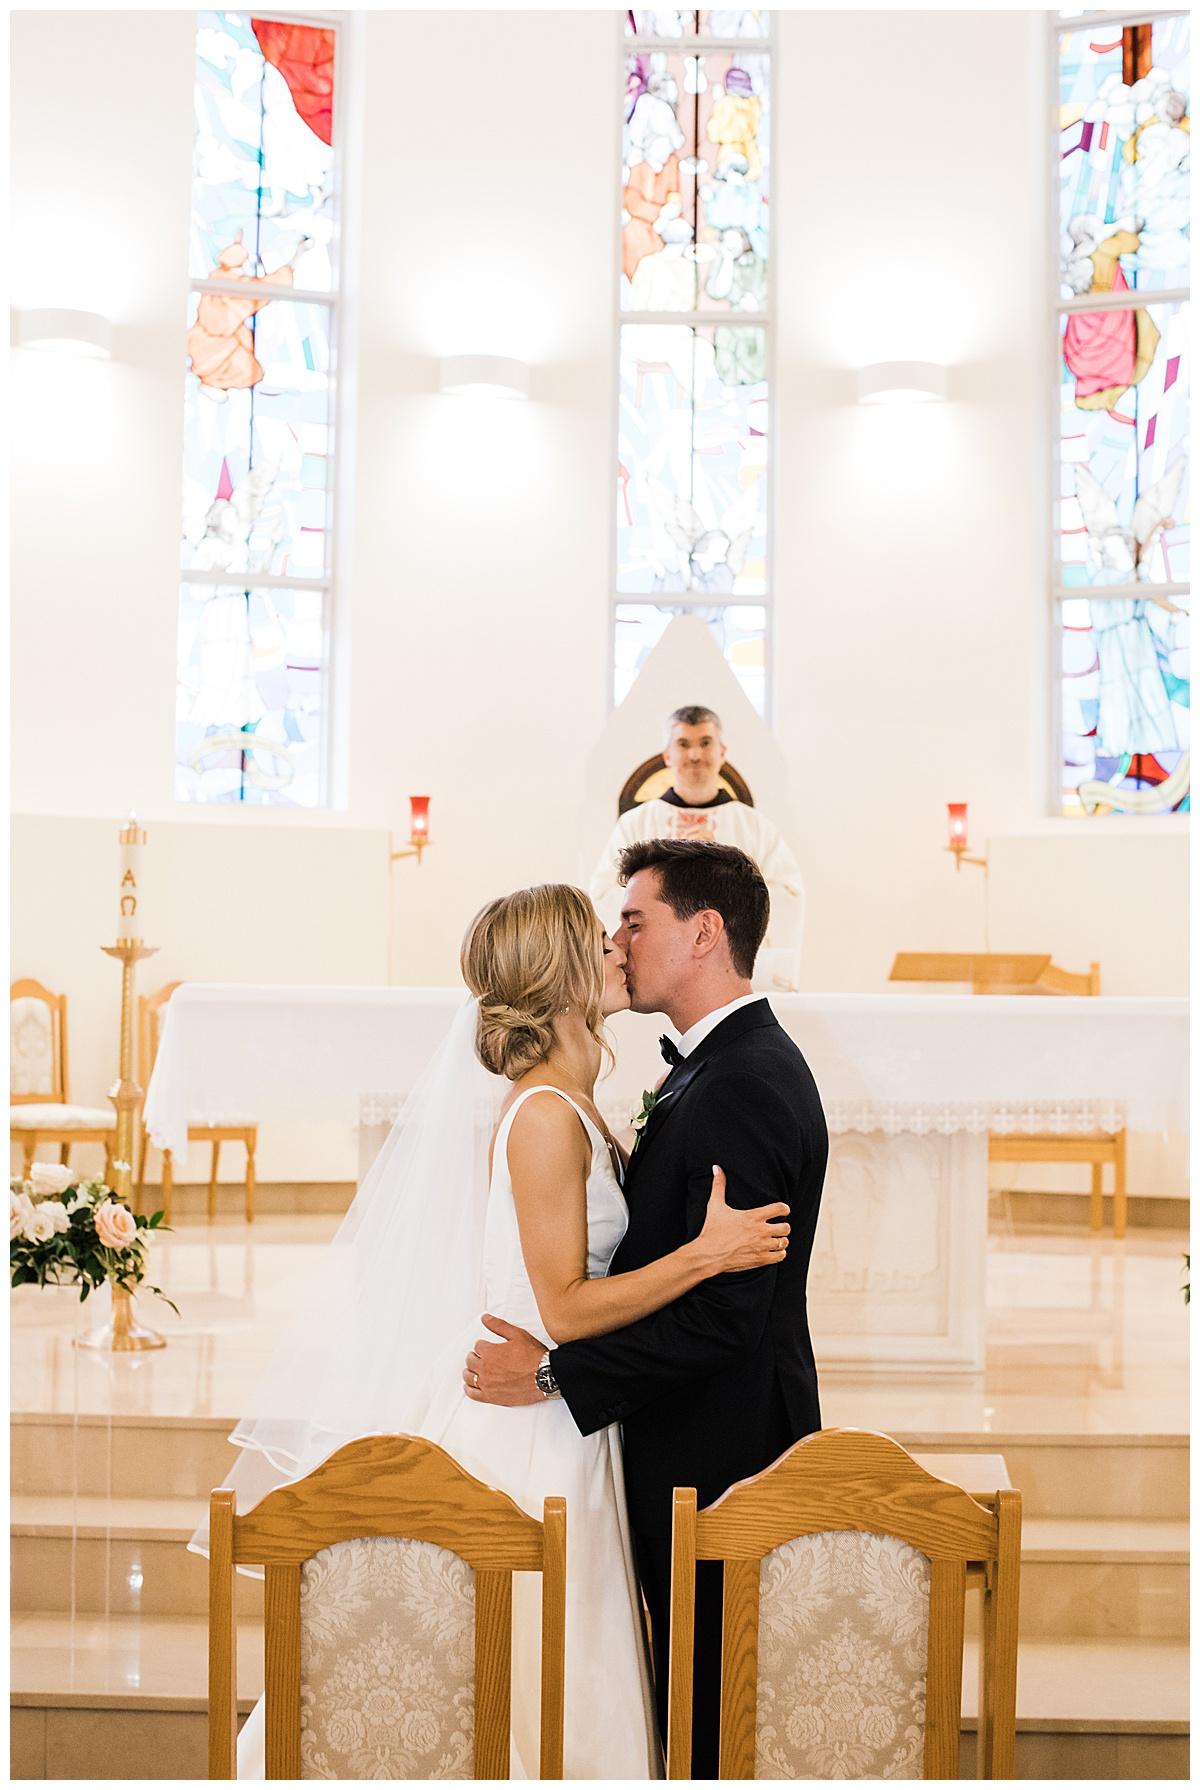 You may kiss the bride| Bride and groom first kiss| Ontario wedding| Toronto wedding photographer| 3photography